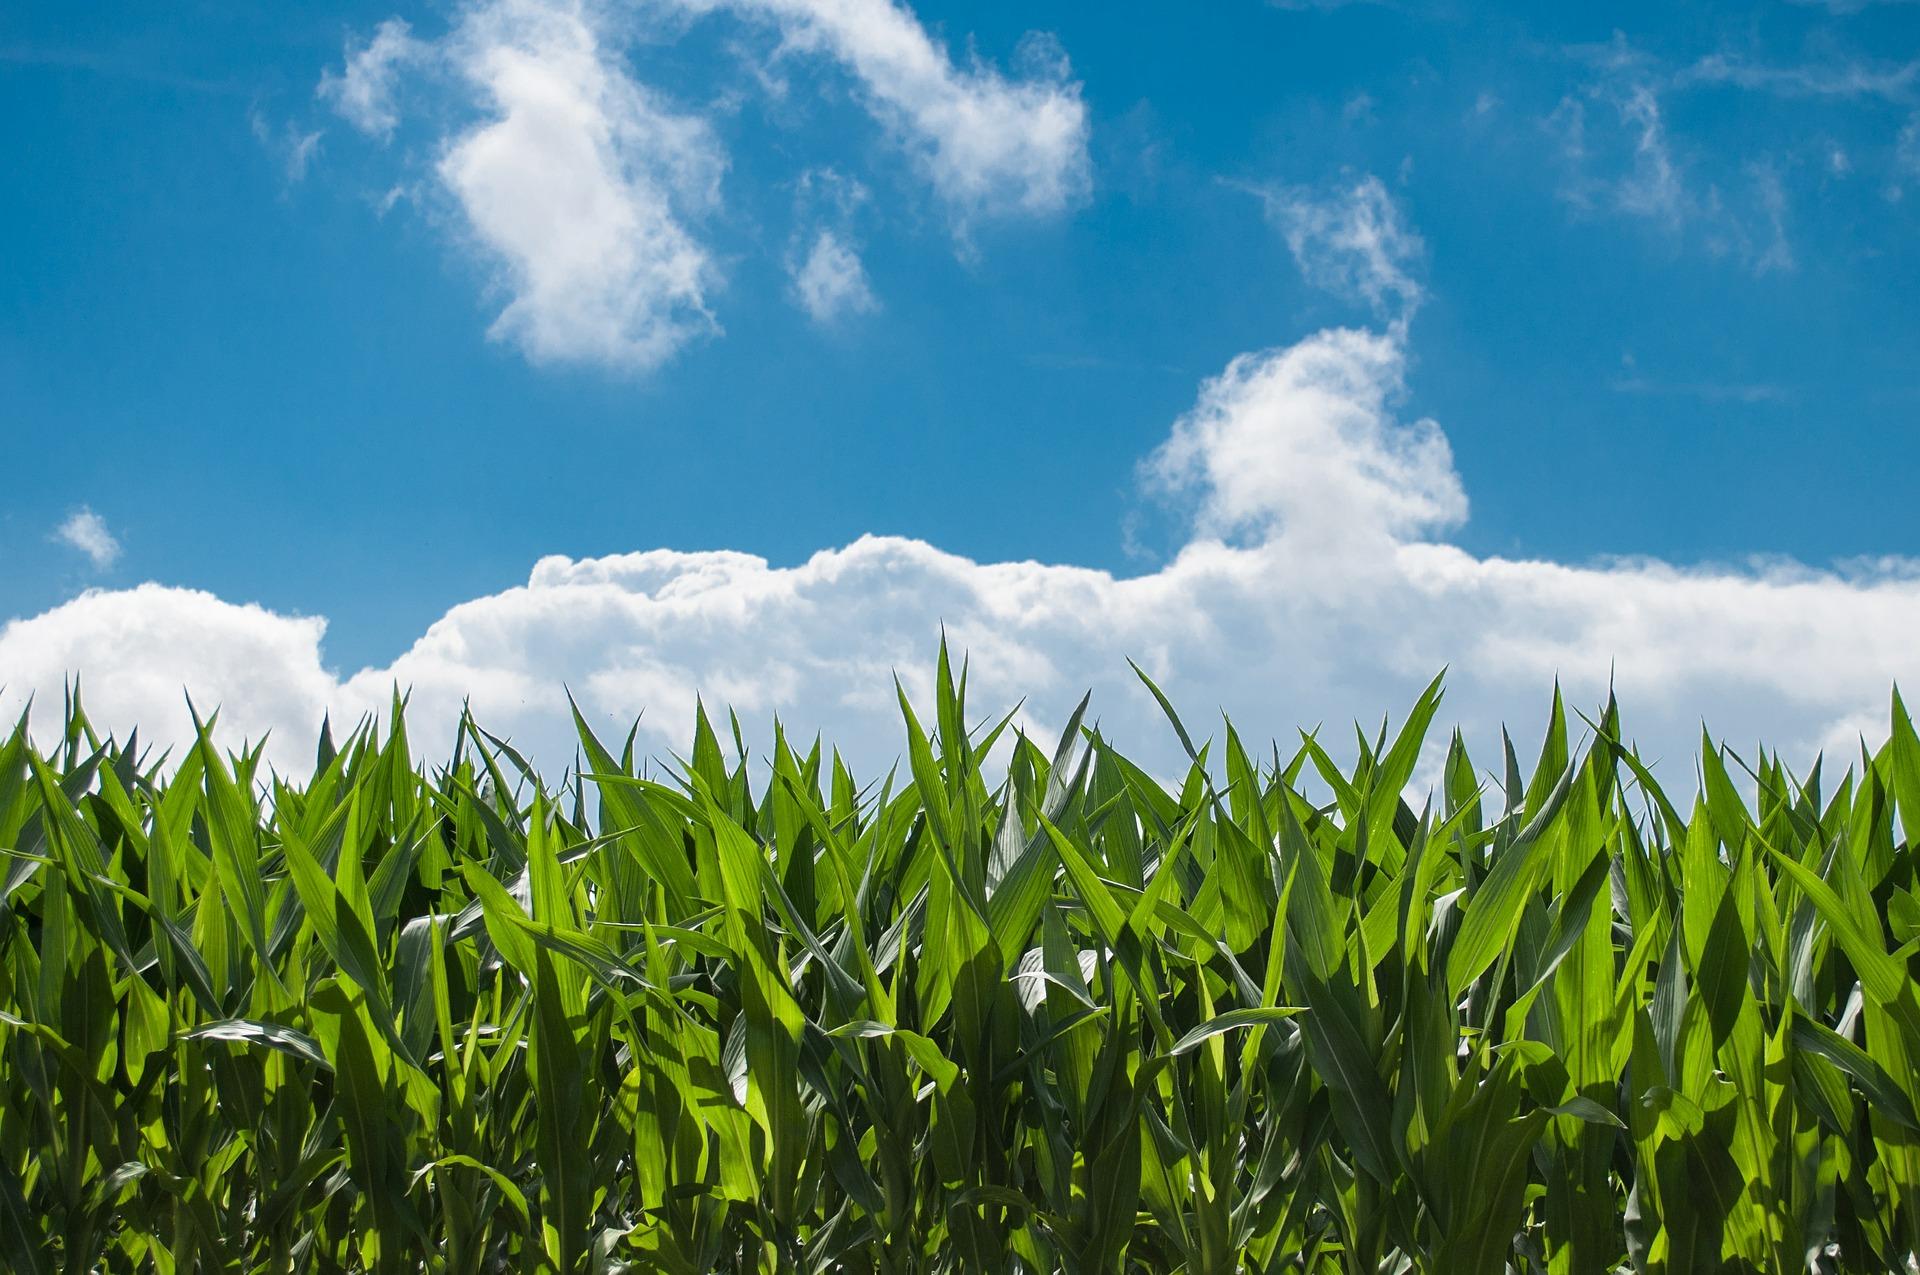 Agrosysteme